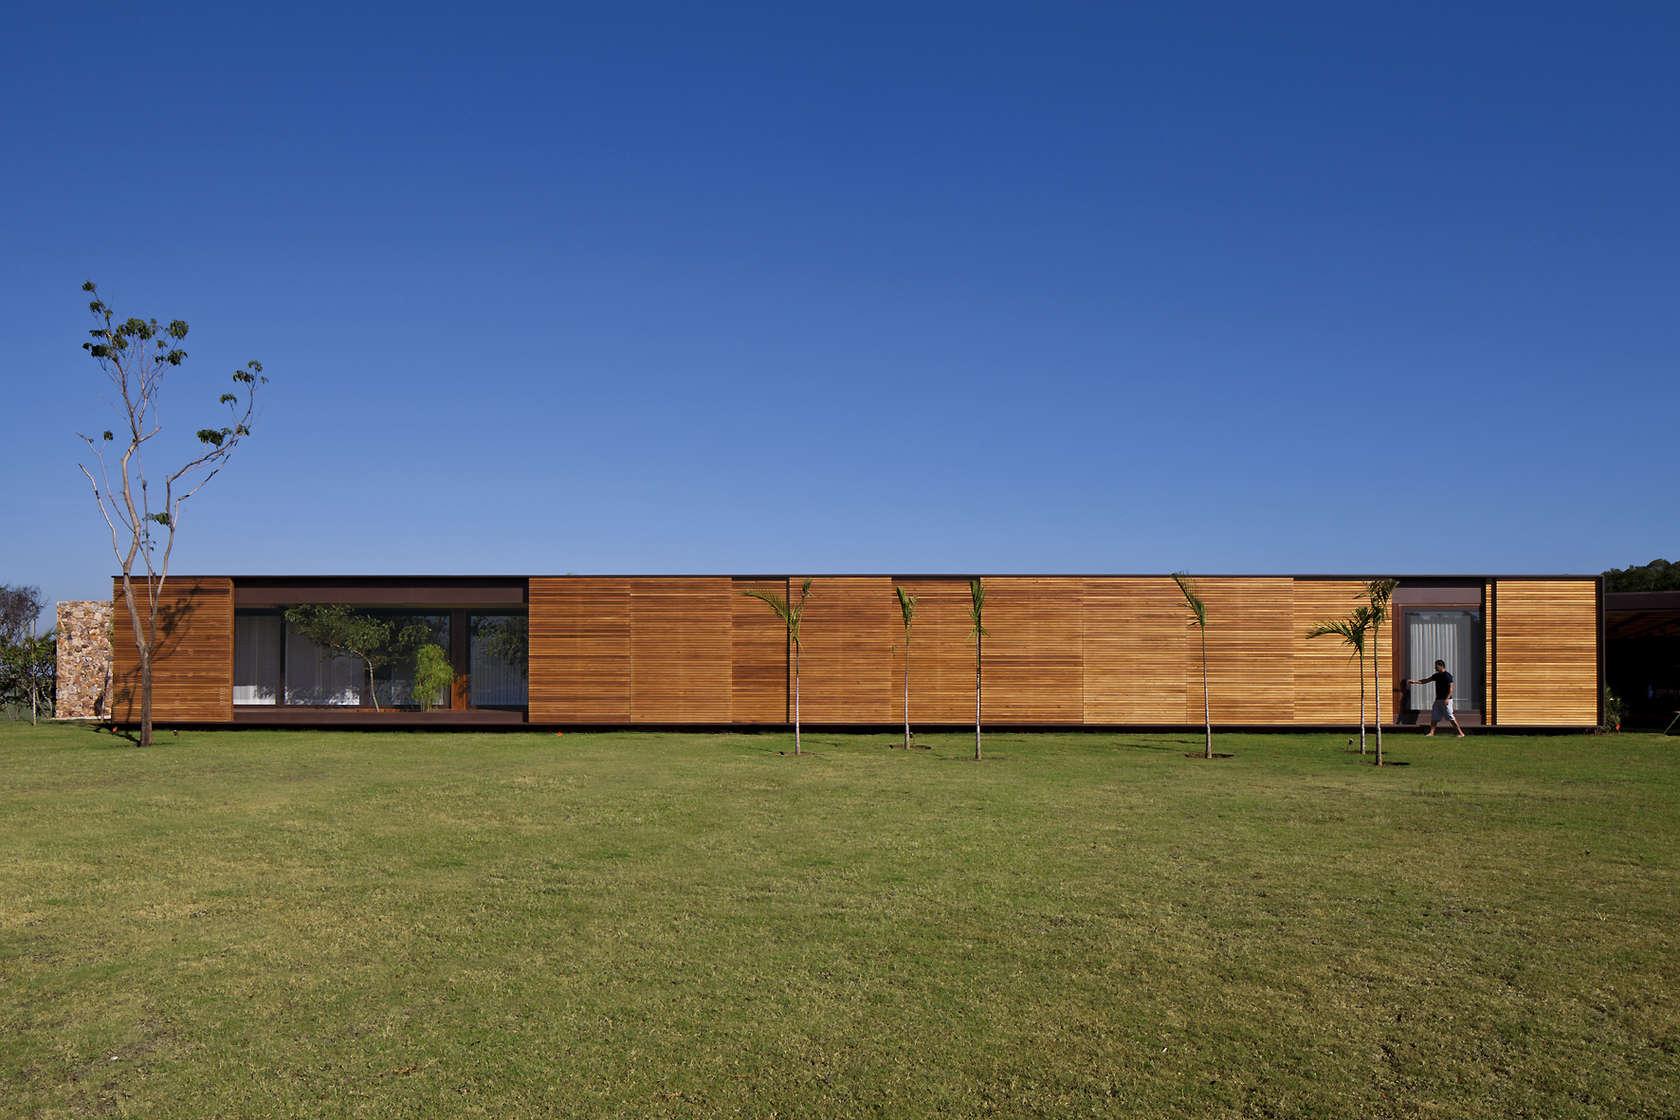 Bedrooms´ volume wooden façade, some blinds opened